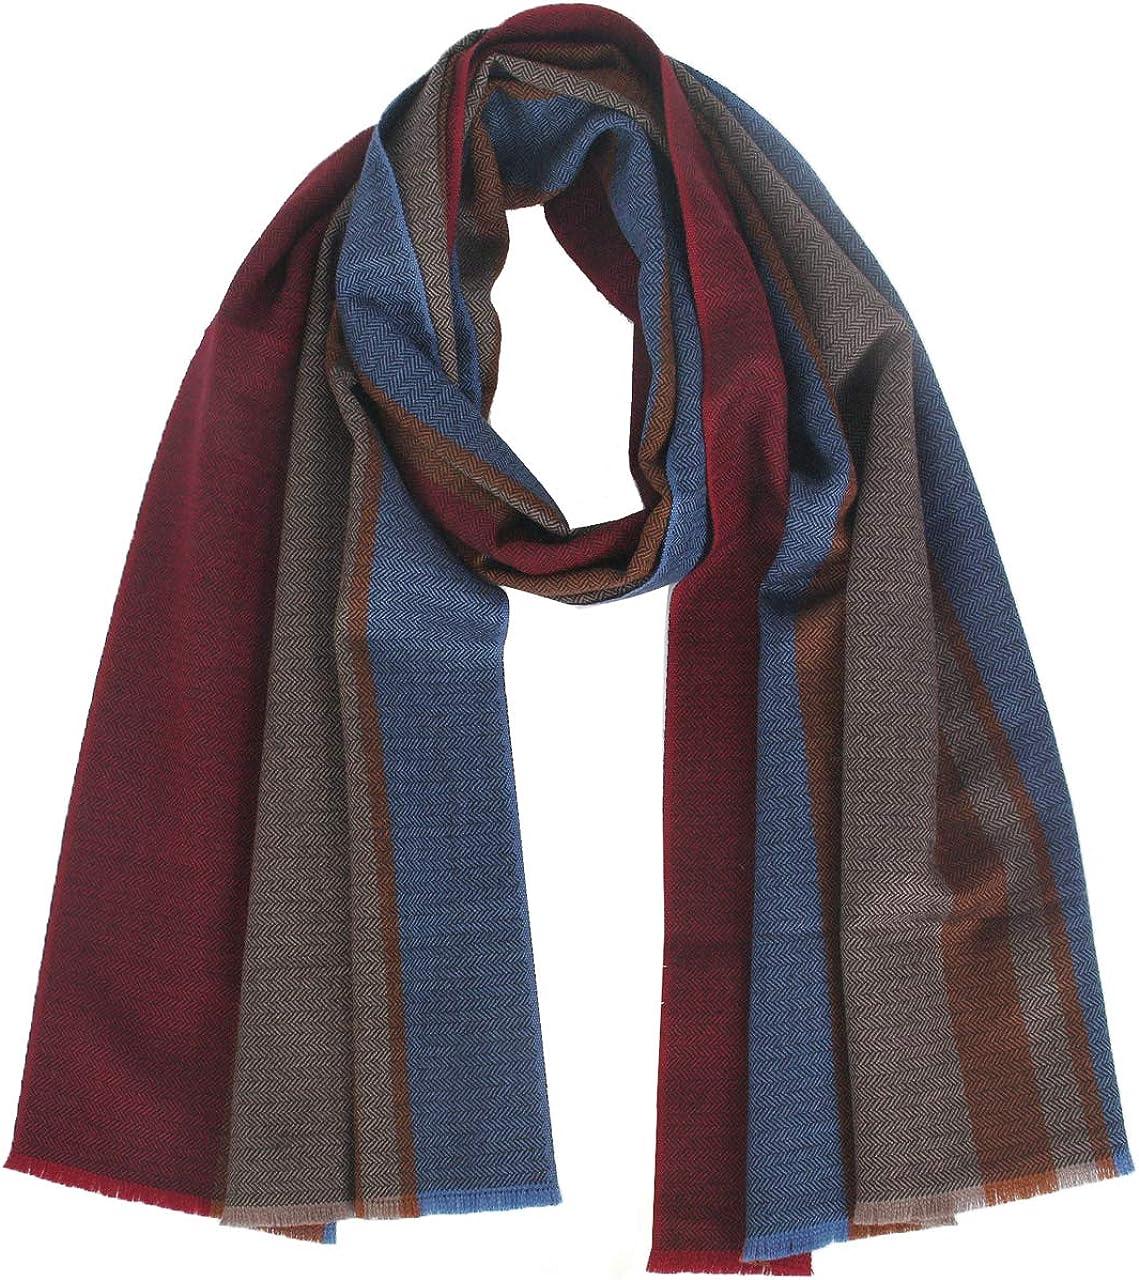 Wool Scarf Men,Muffler Warm Winter Soft Long Striped Thick Fashion 67/×16 Gift